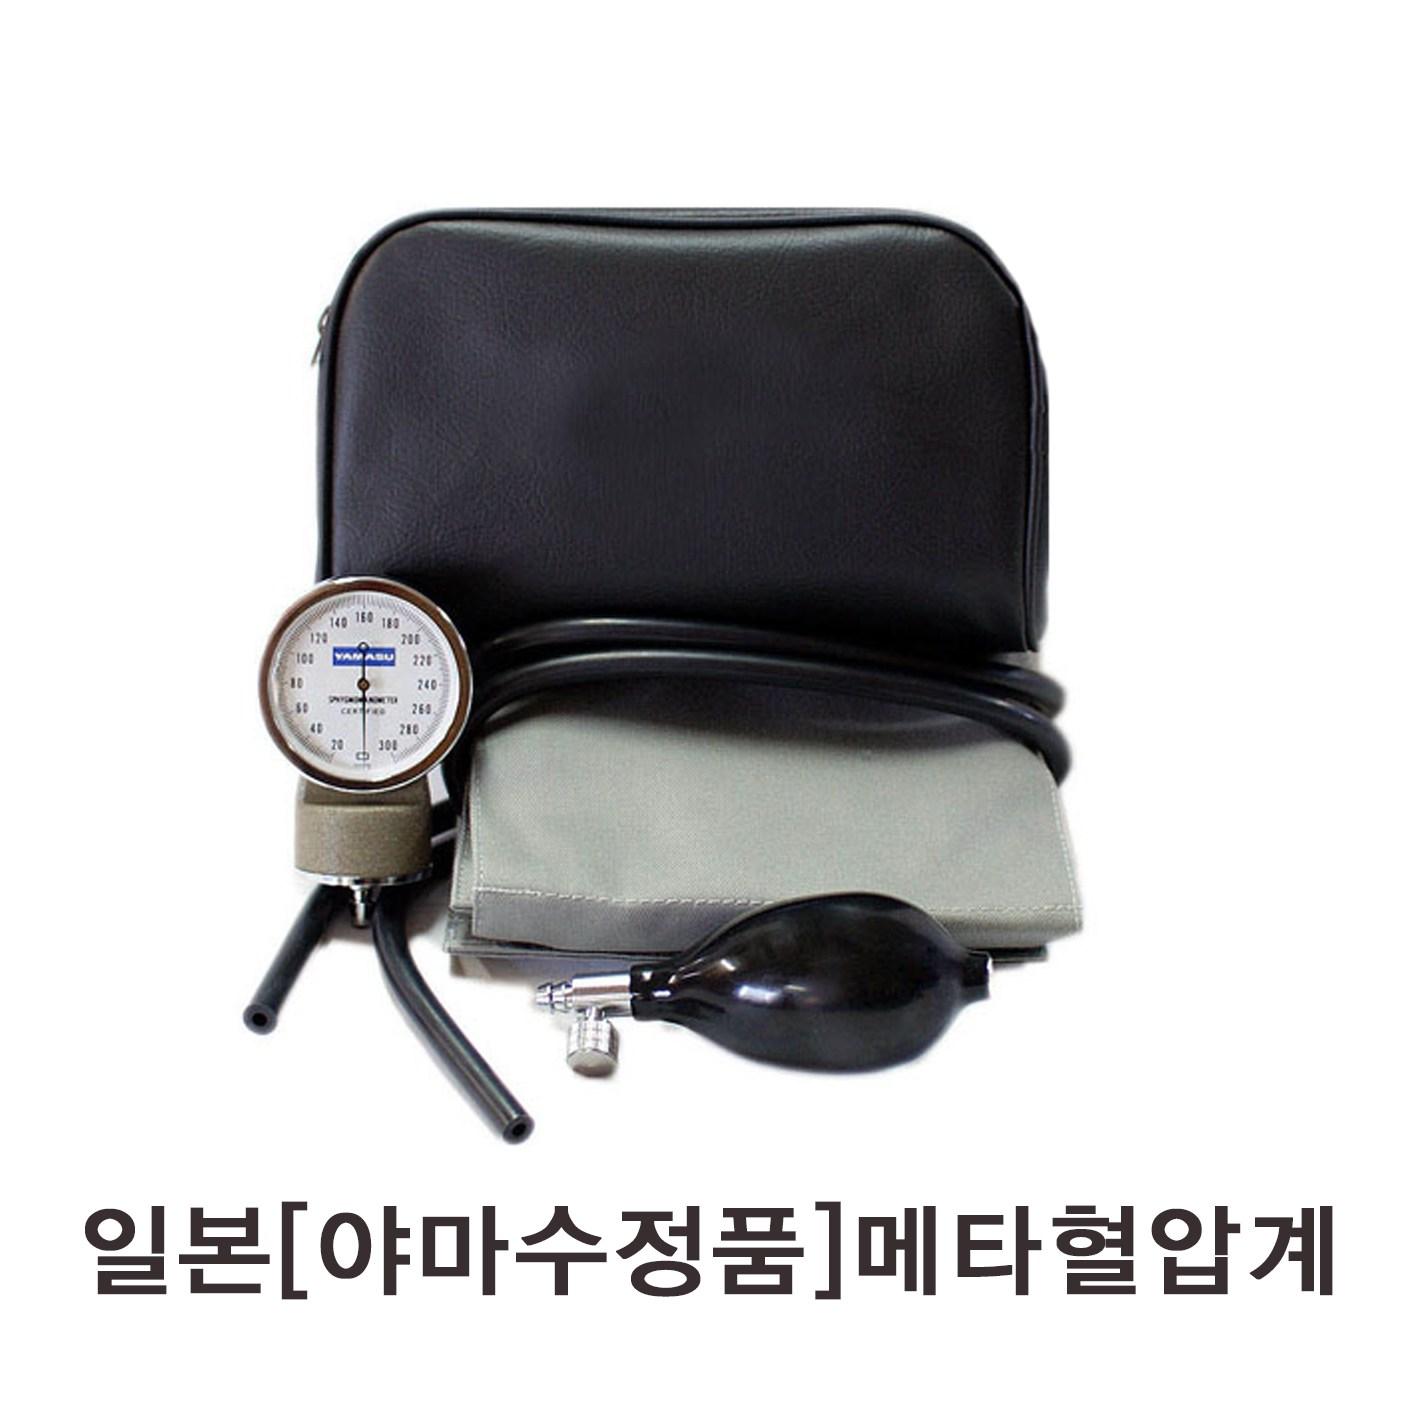 YAMASU 메타혈압계 혈압계, 1개